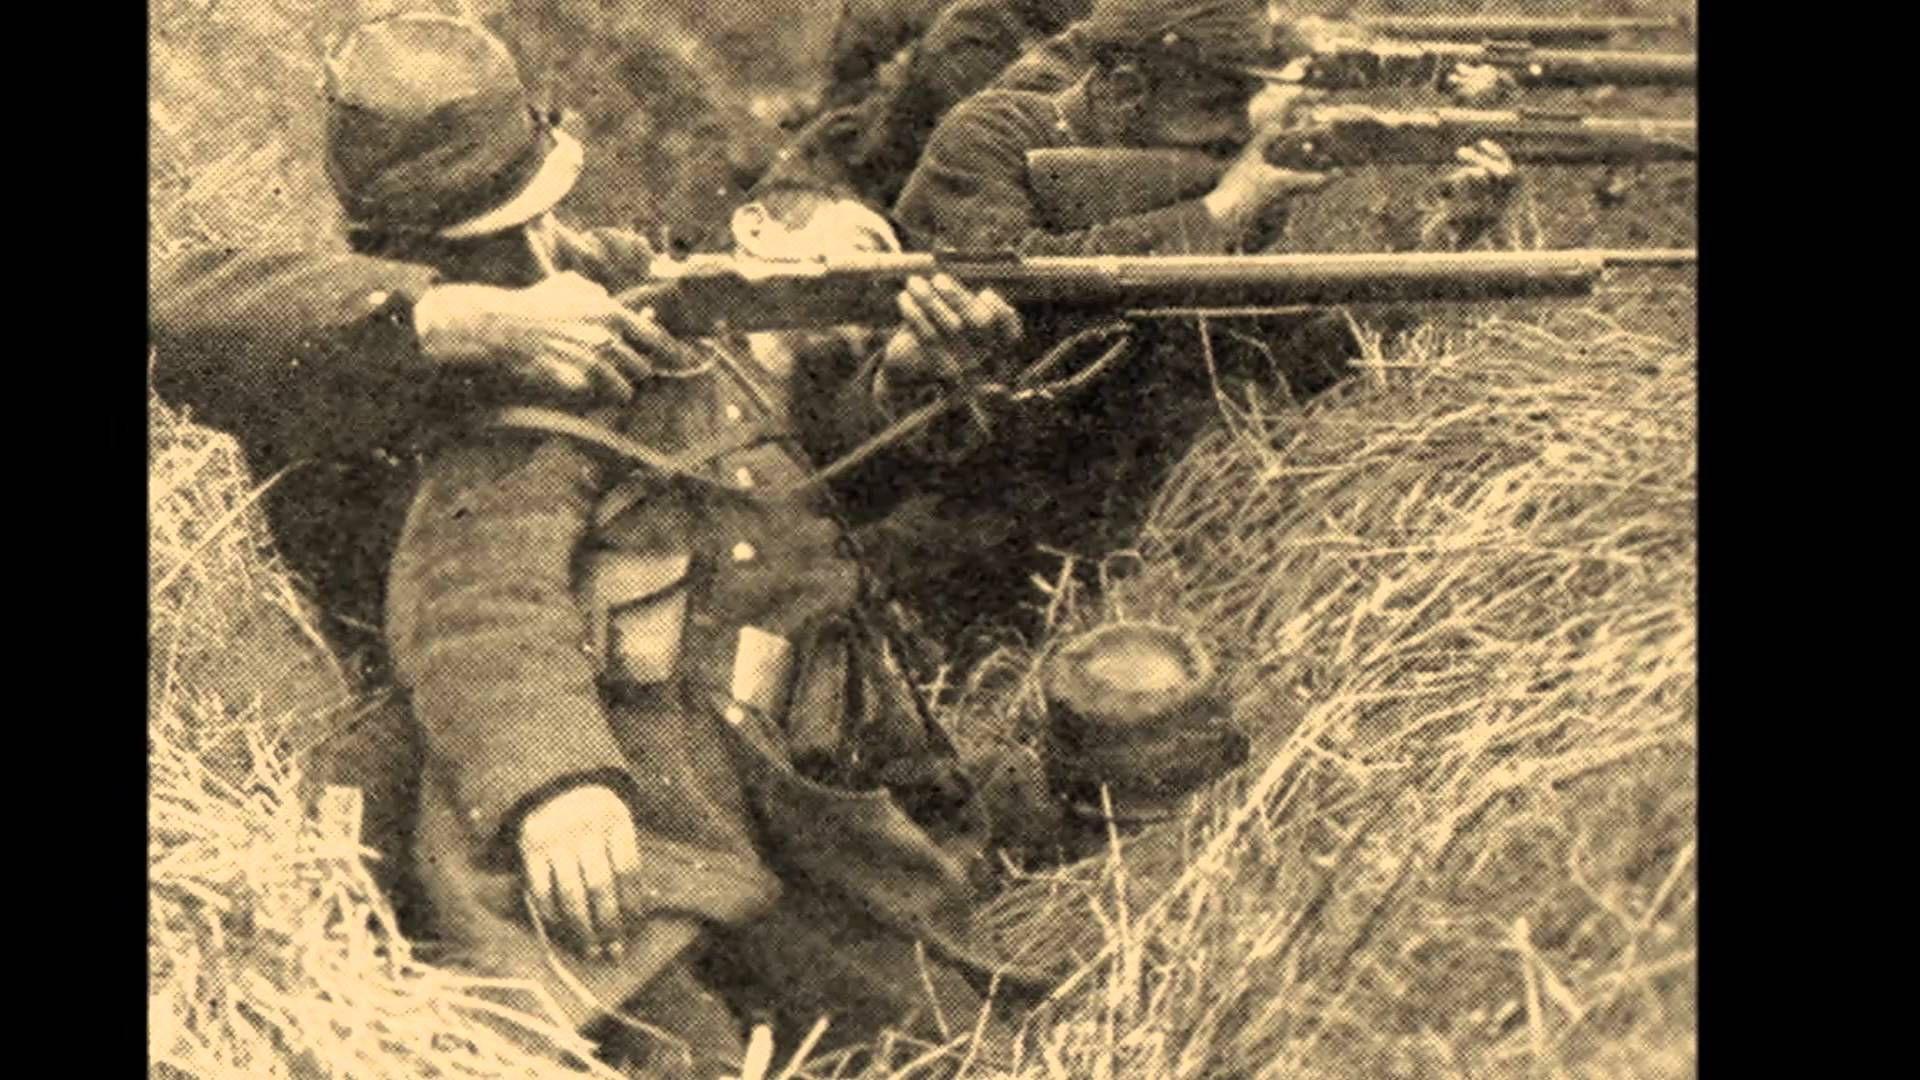 War World War 1 Pictures On Video 1914 1918 World War One War Photography World War I